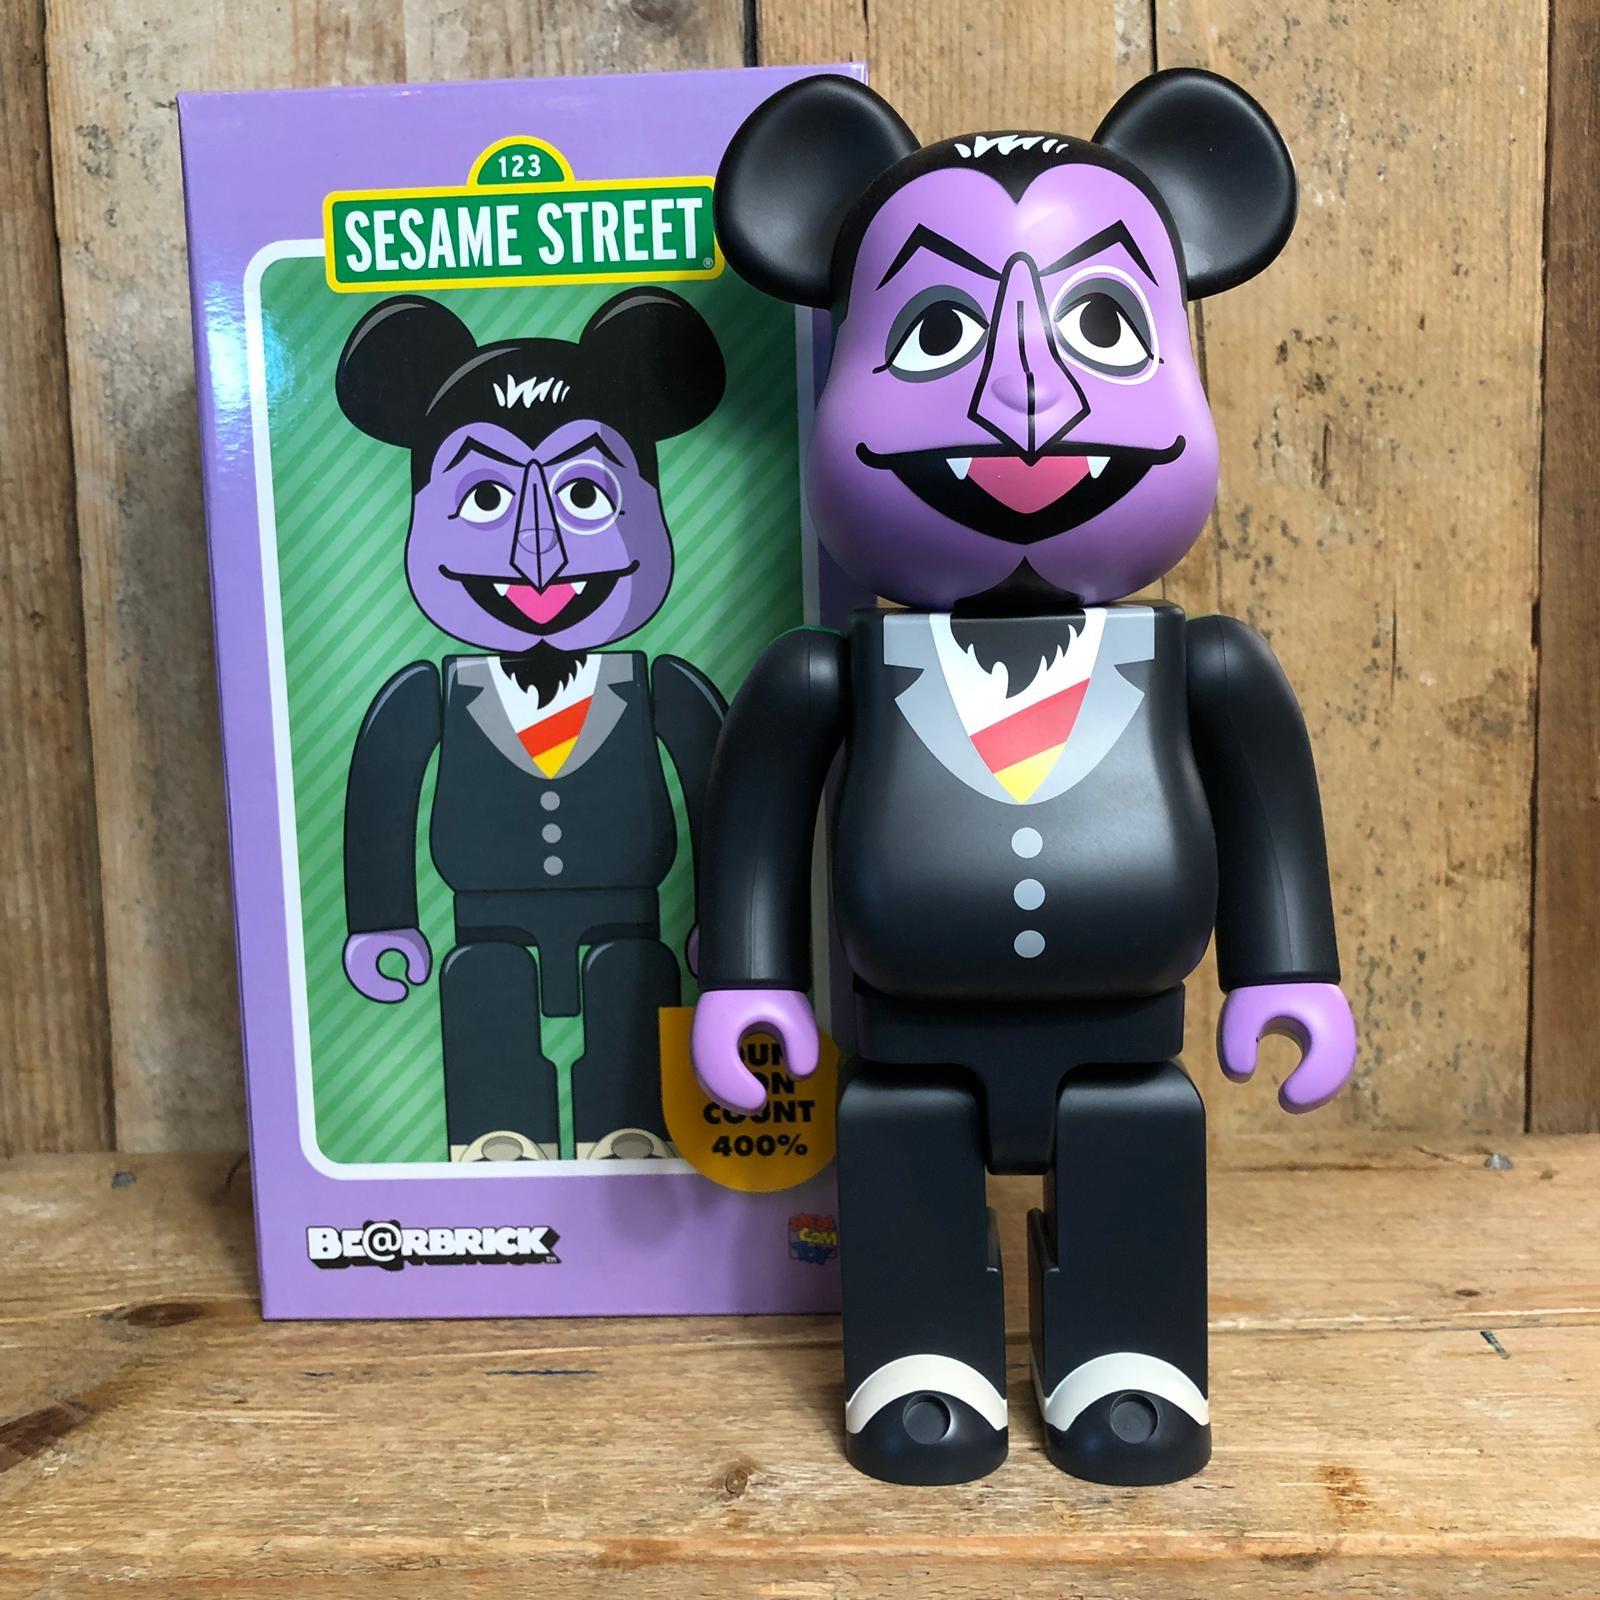 Be@rbrick Medicom Toy Count Von Count 400% Sesame Street 123